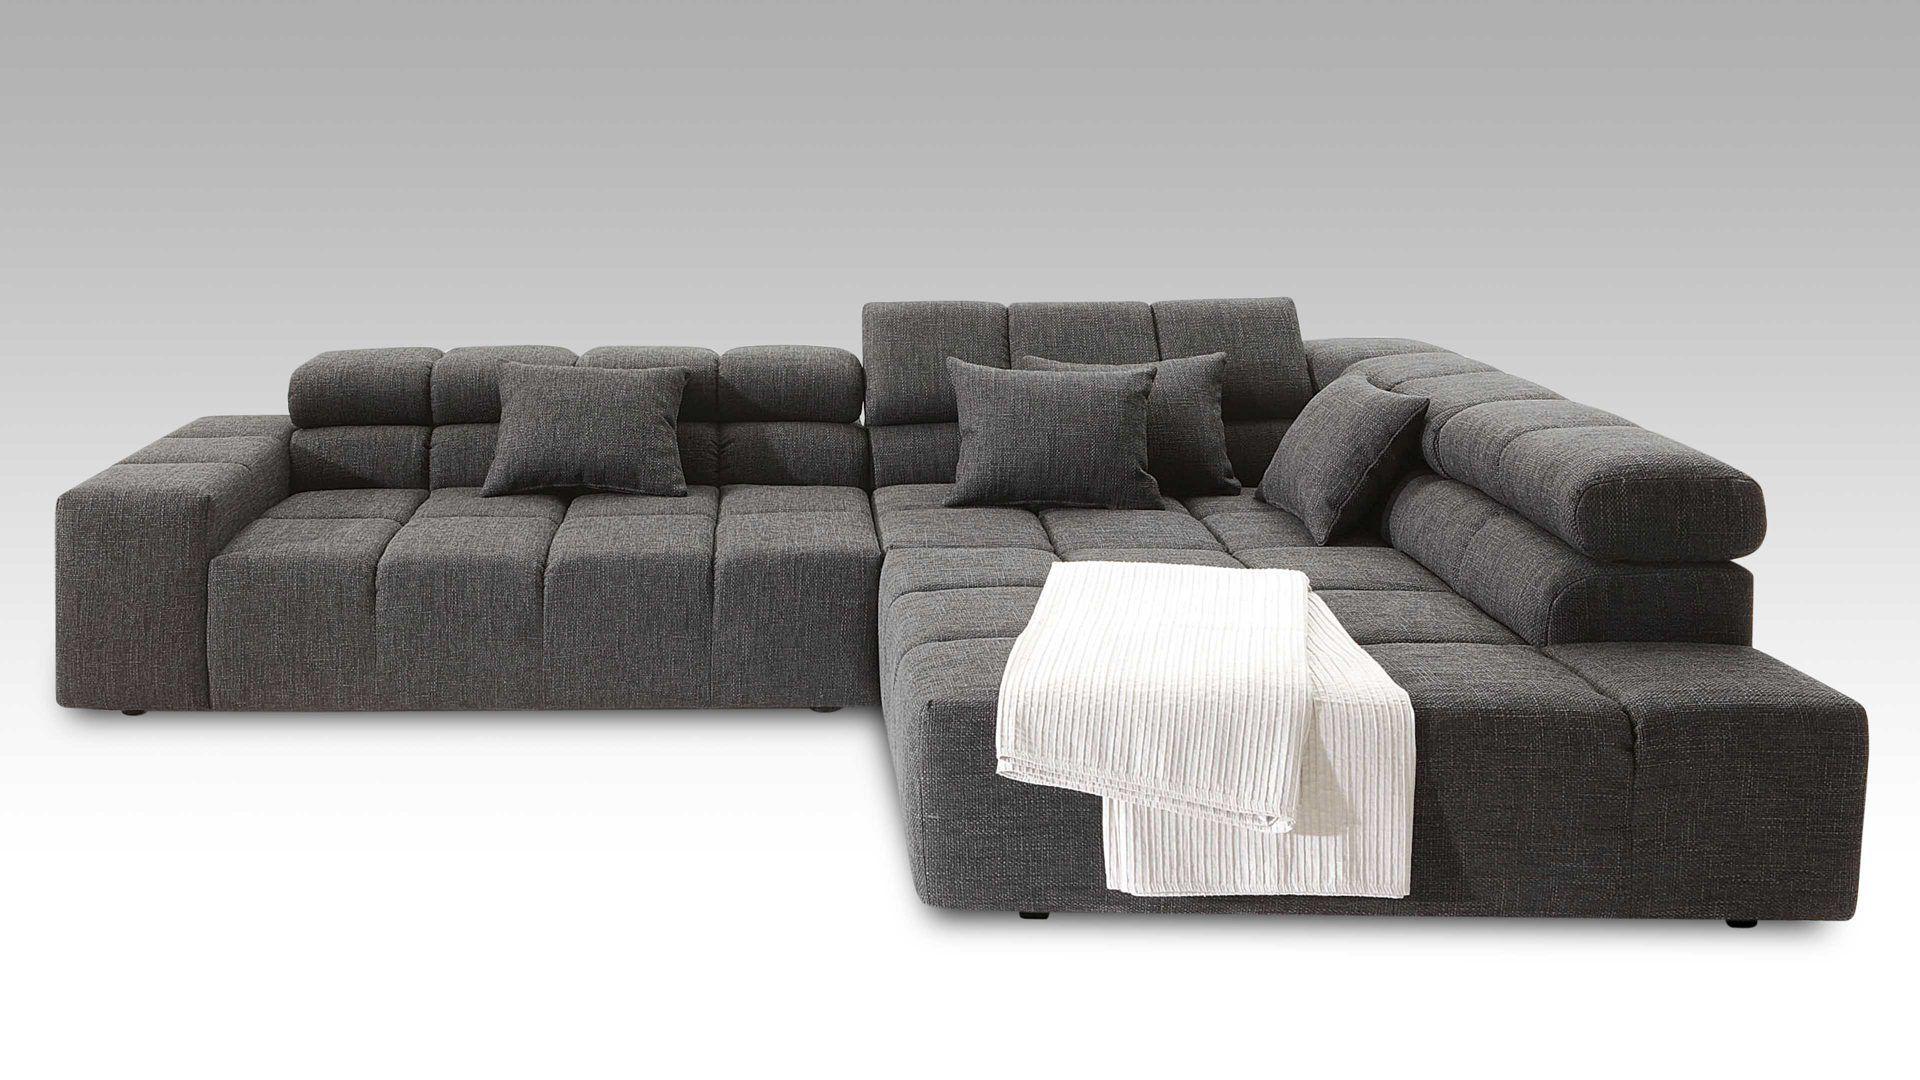 Ecksofa günstig  Mobila.de | Möbel A-Z | Couches + Sofas | Lounge-Ecksofa bzw ...